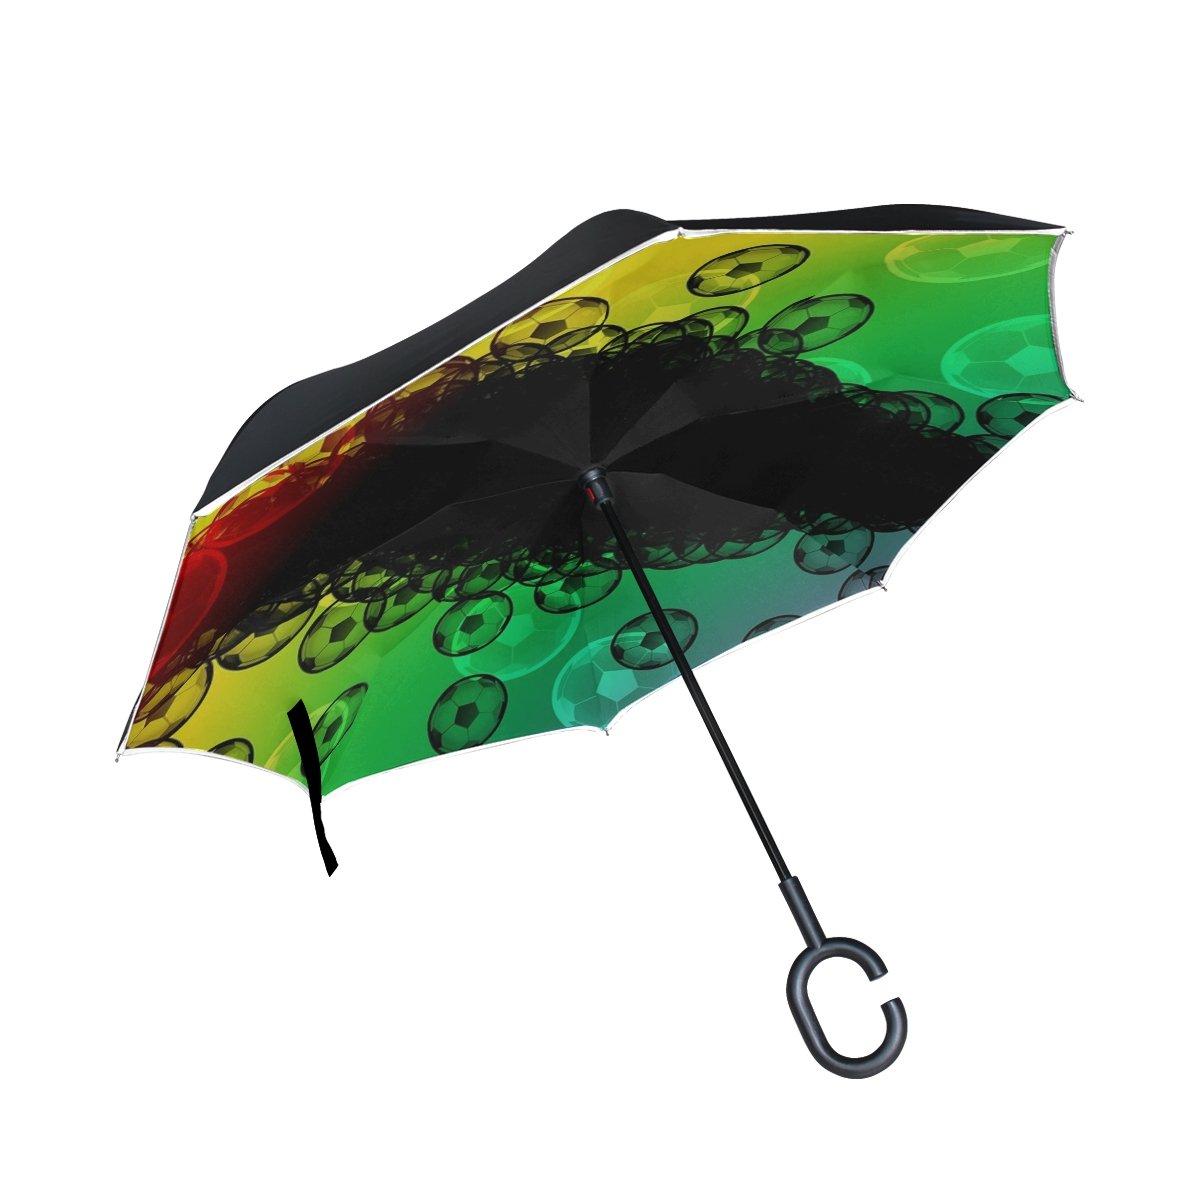 MAPOLO Red Blue White Nautical Anchor Print Windproof Rain Travel Canopy 3 Folds Auto Open Close Button Umbrella